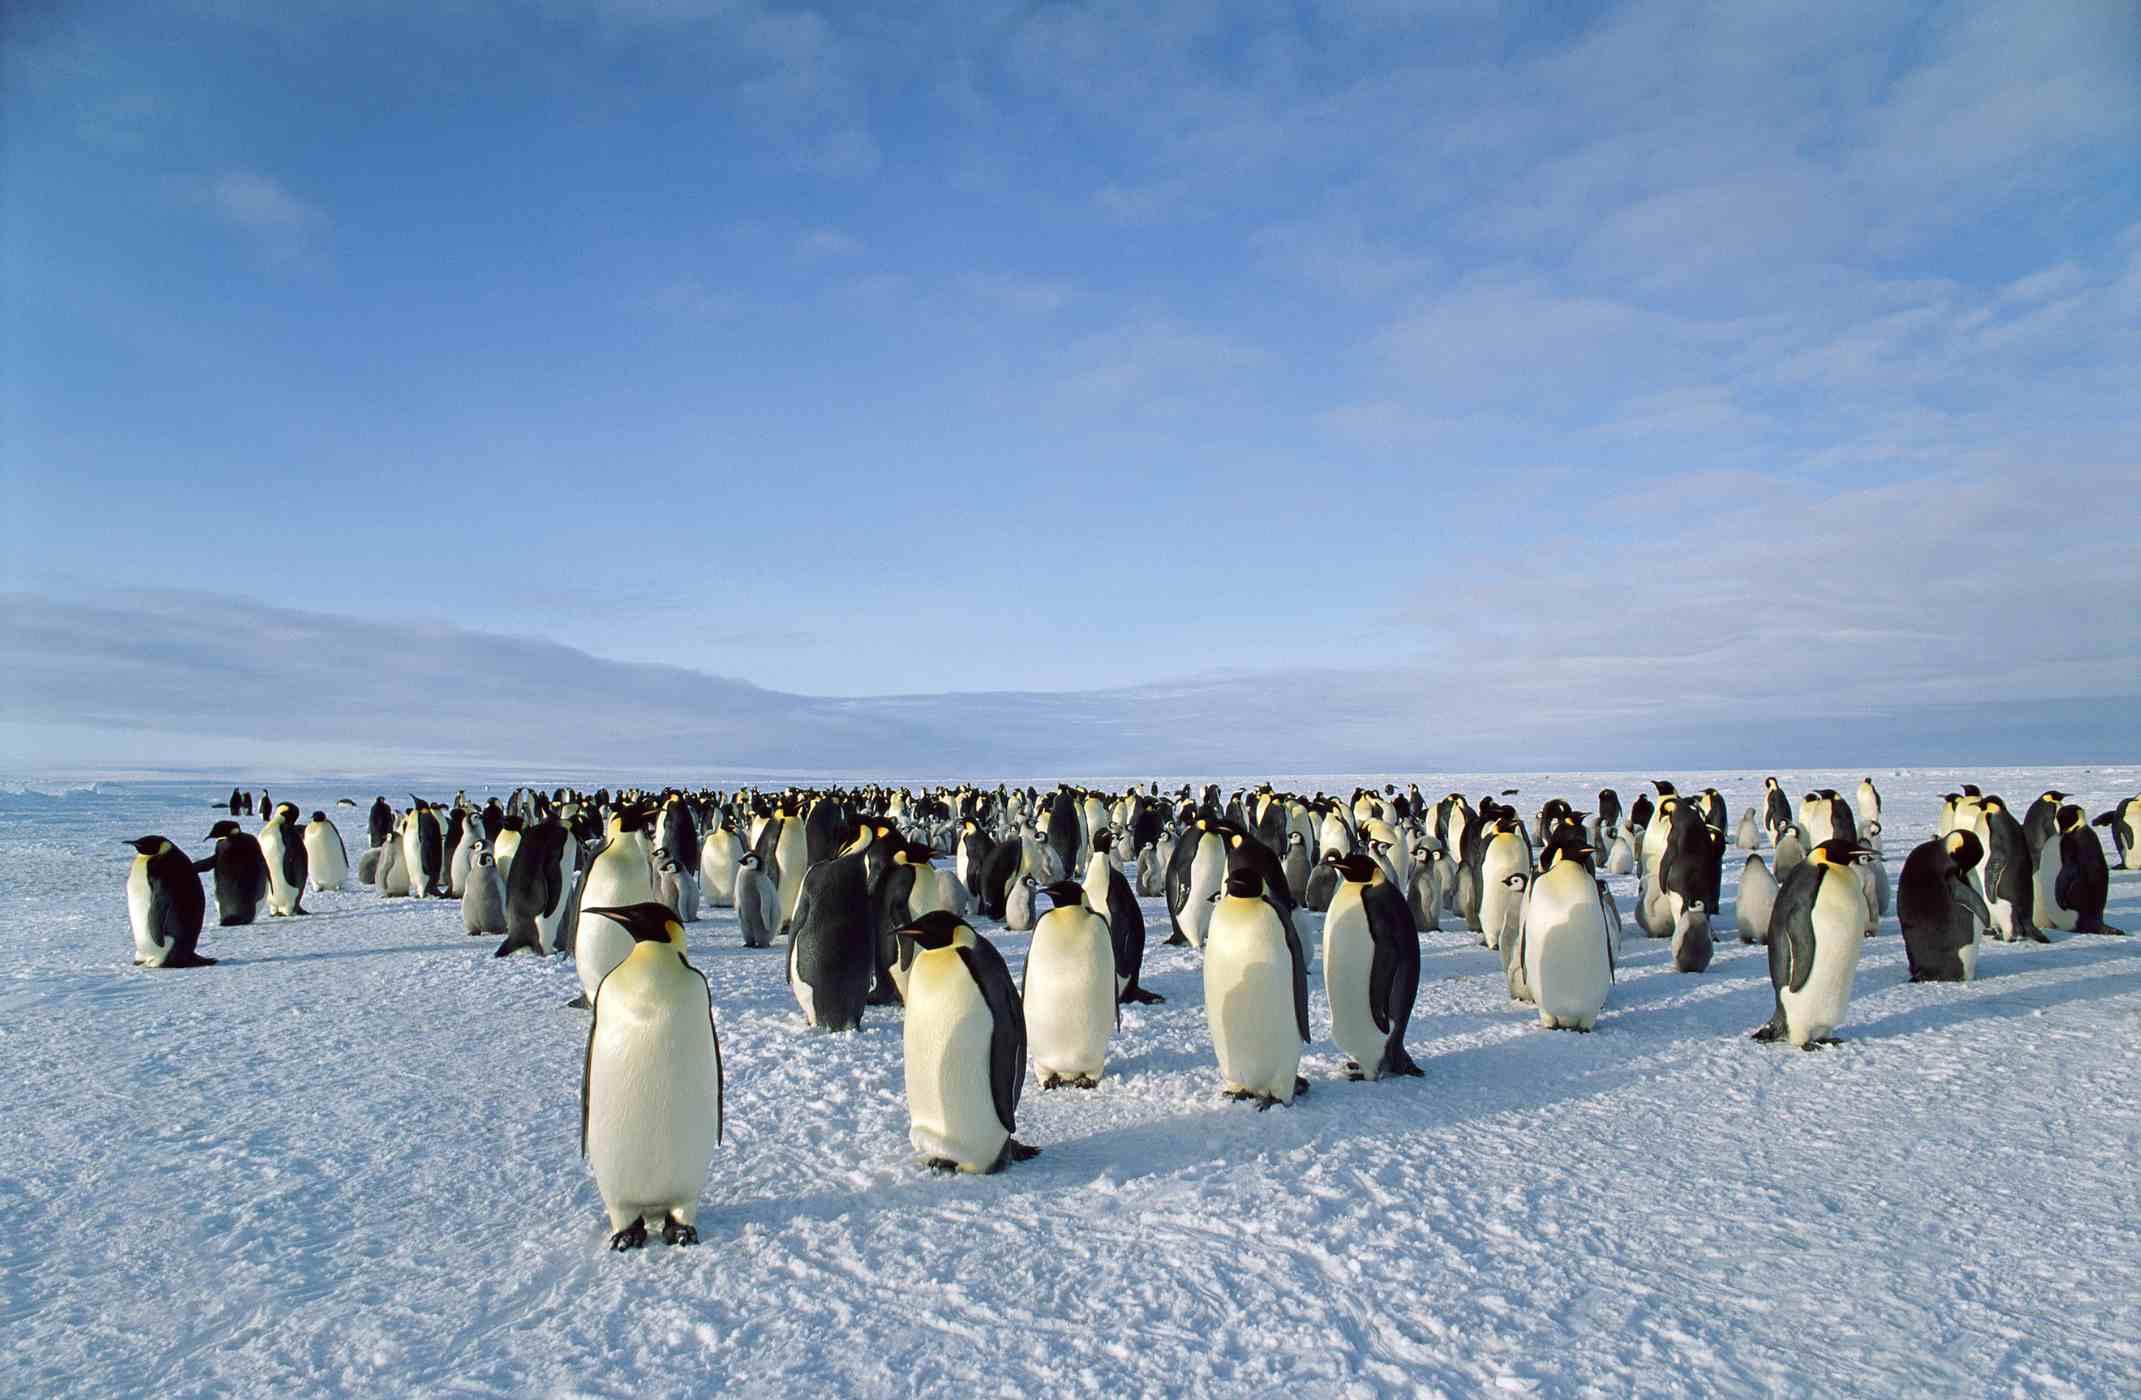 emperor penguins on parade